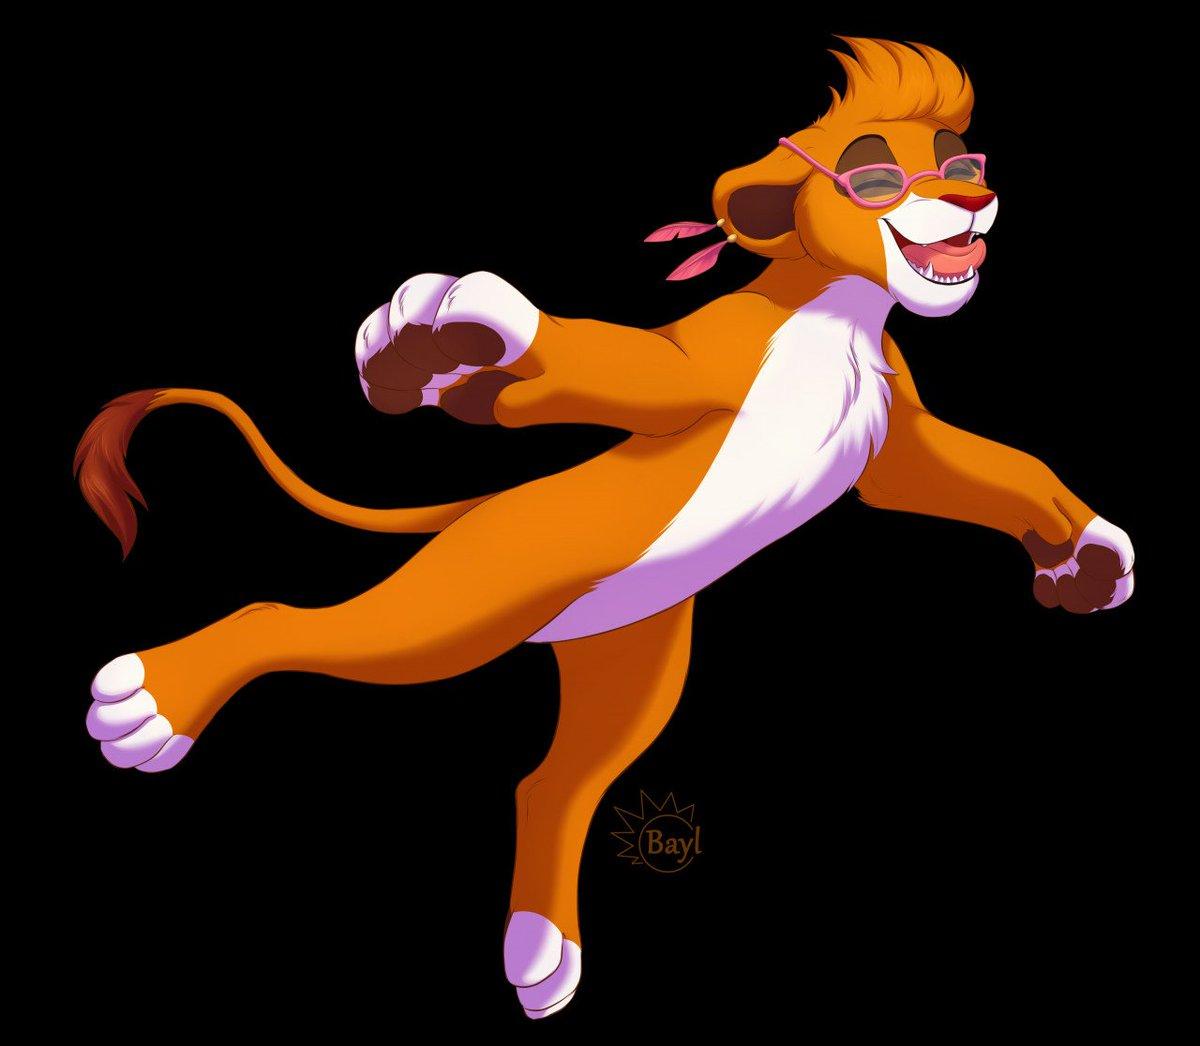 Aisha jumping Commish for Kovu-01 from Fa #Tlk #animalartist #furry #animalart  #Bayl #Aisha #lioness #lion #feral #TheLionKing #the_lion_king #LionKing